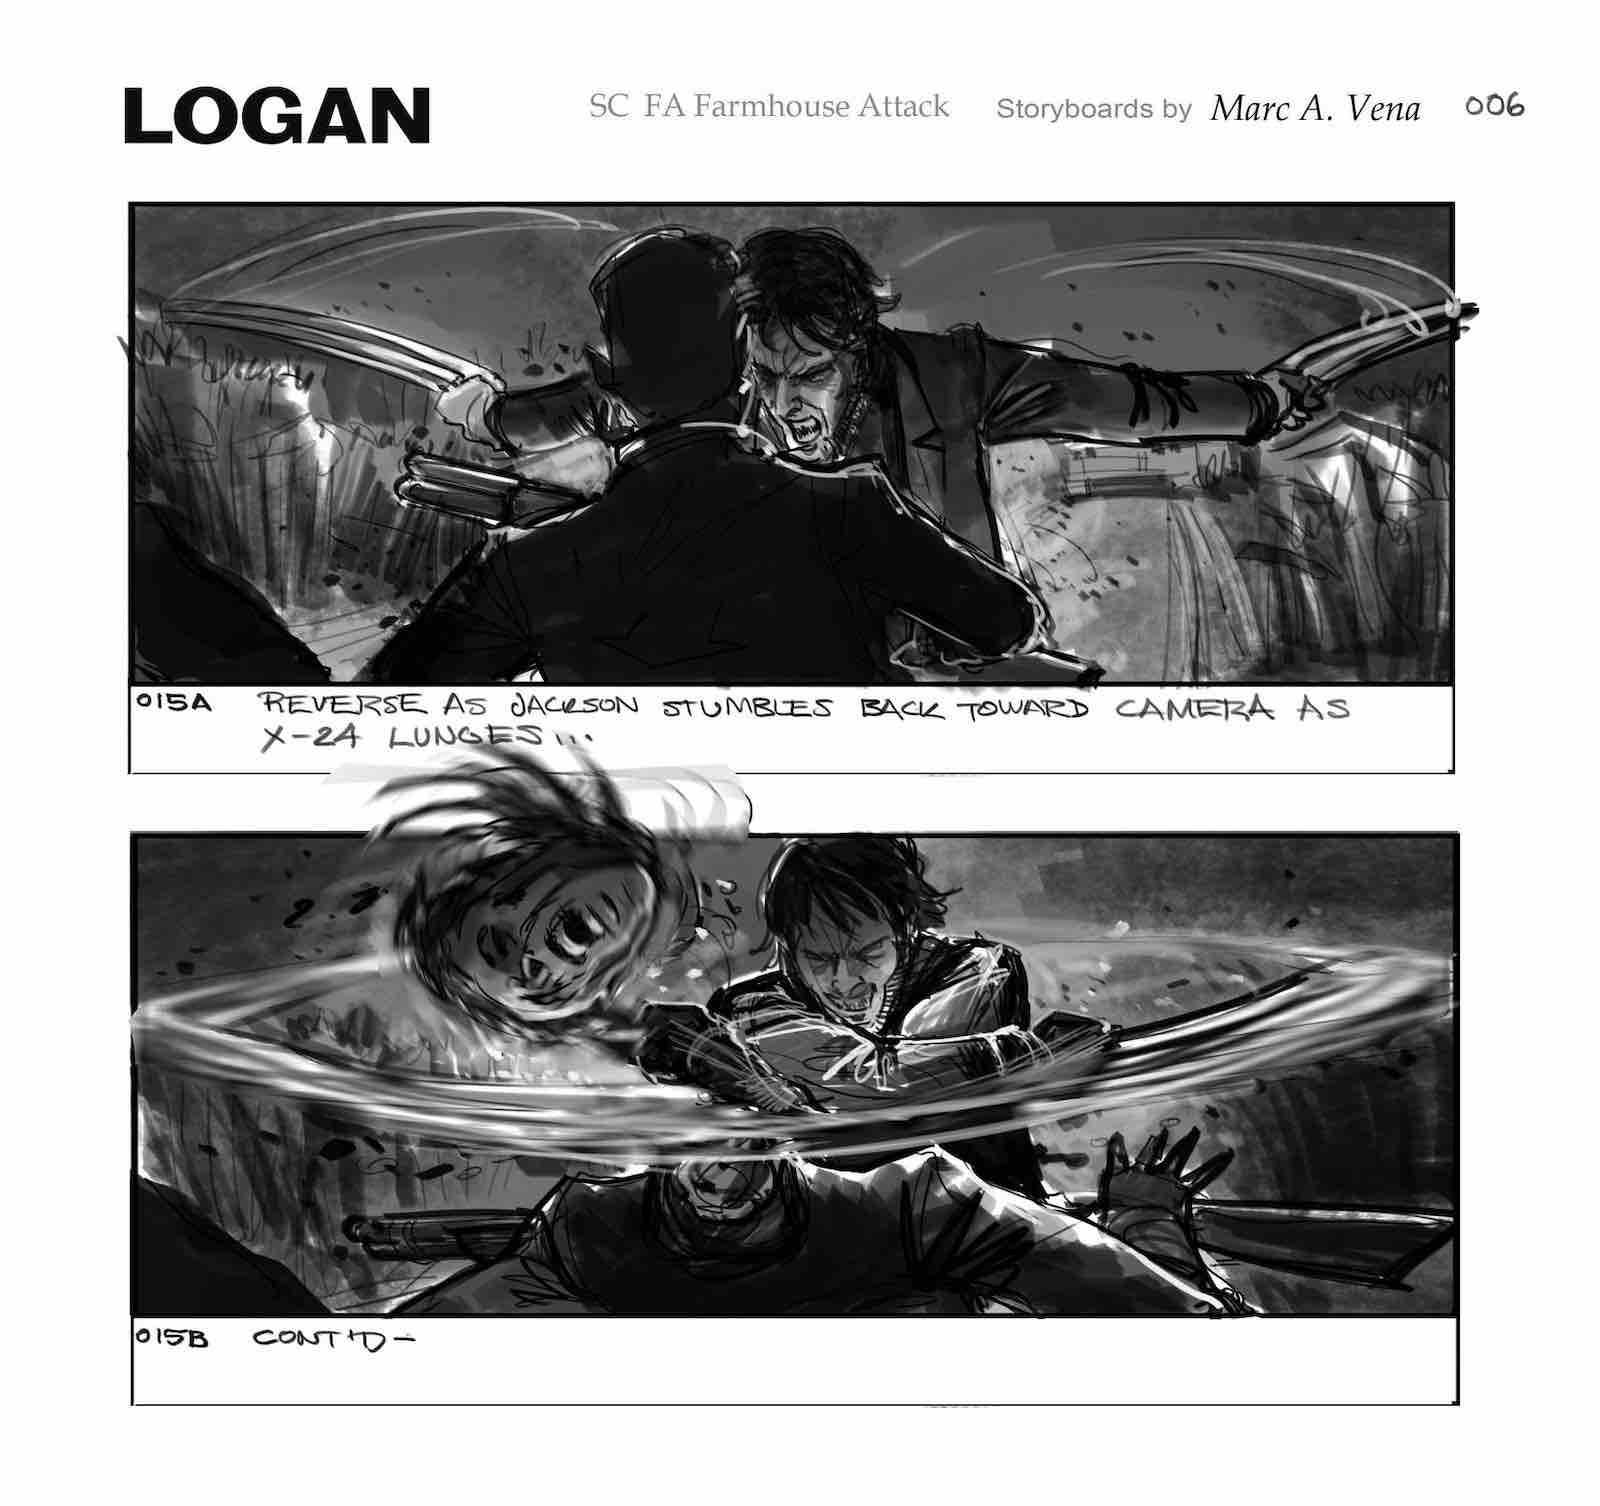 Storyboard Examples - Logan Storyboard - Mark Vena - StudioBinder